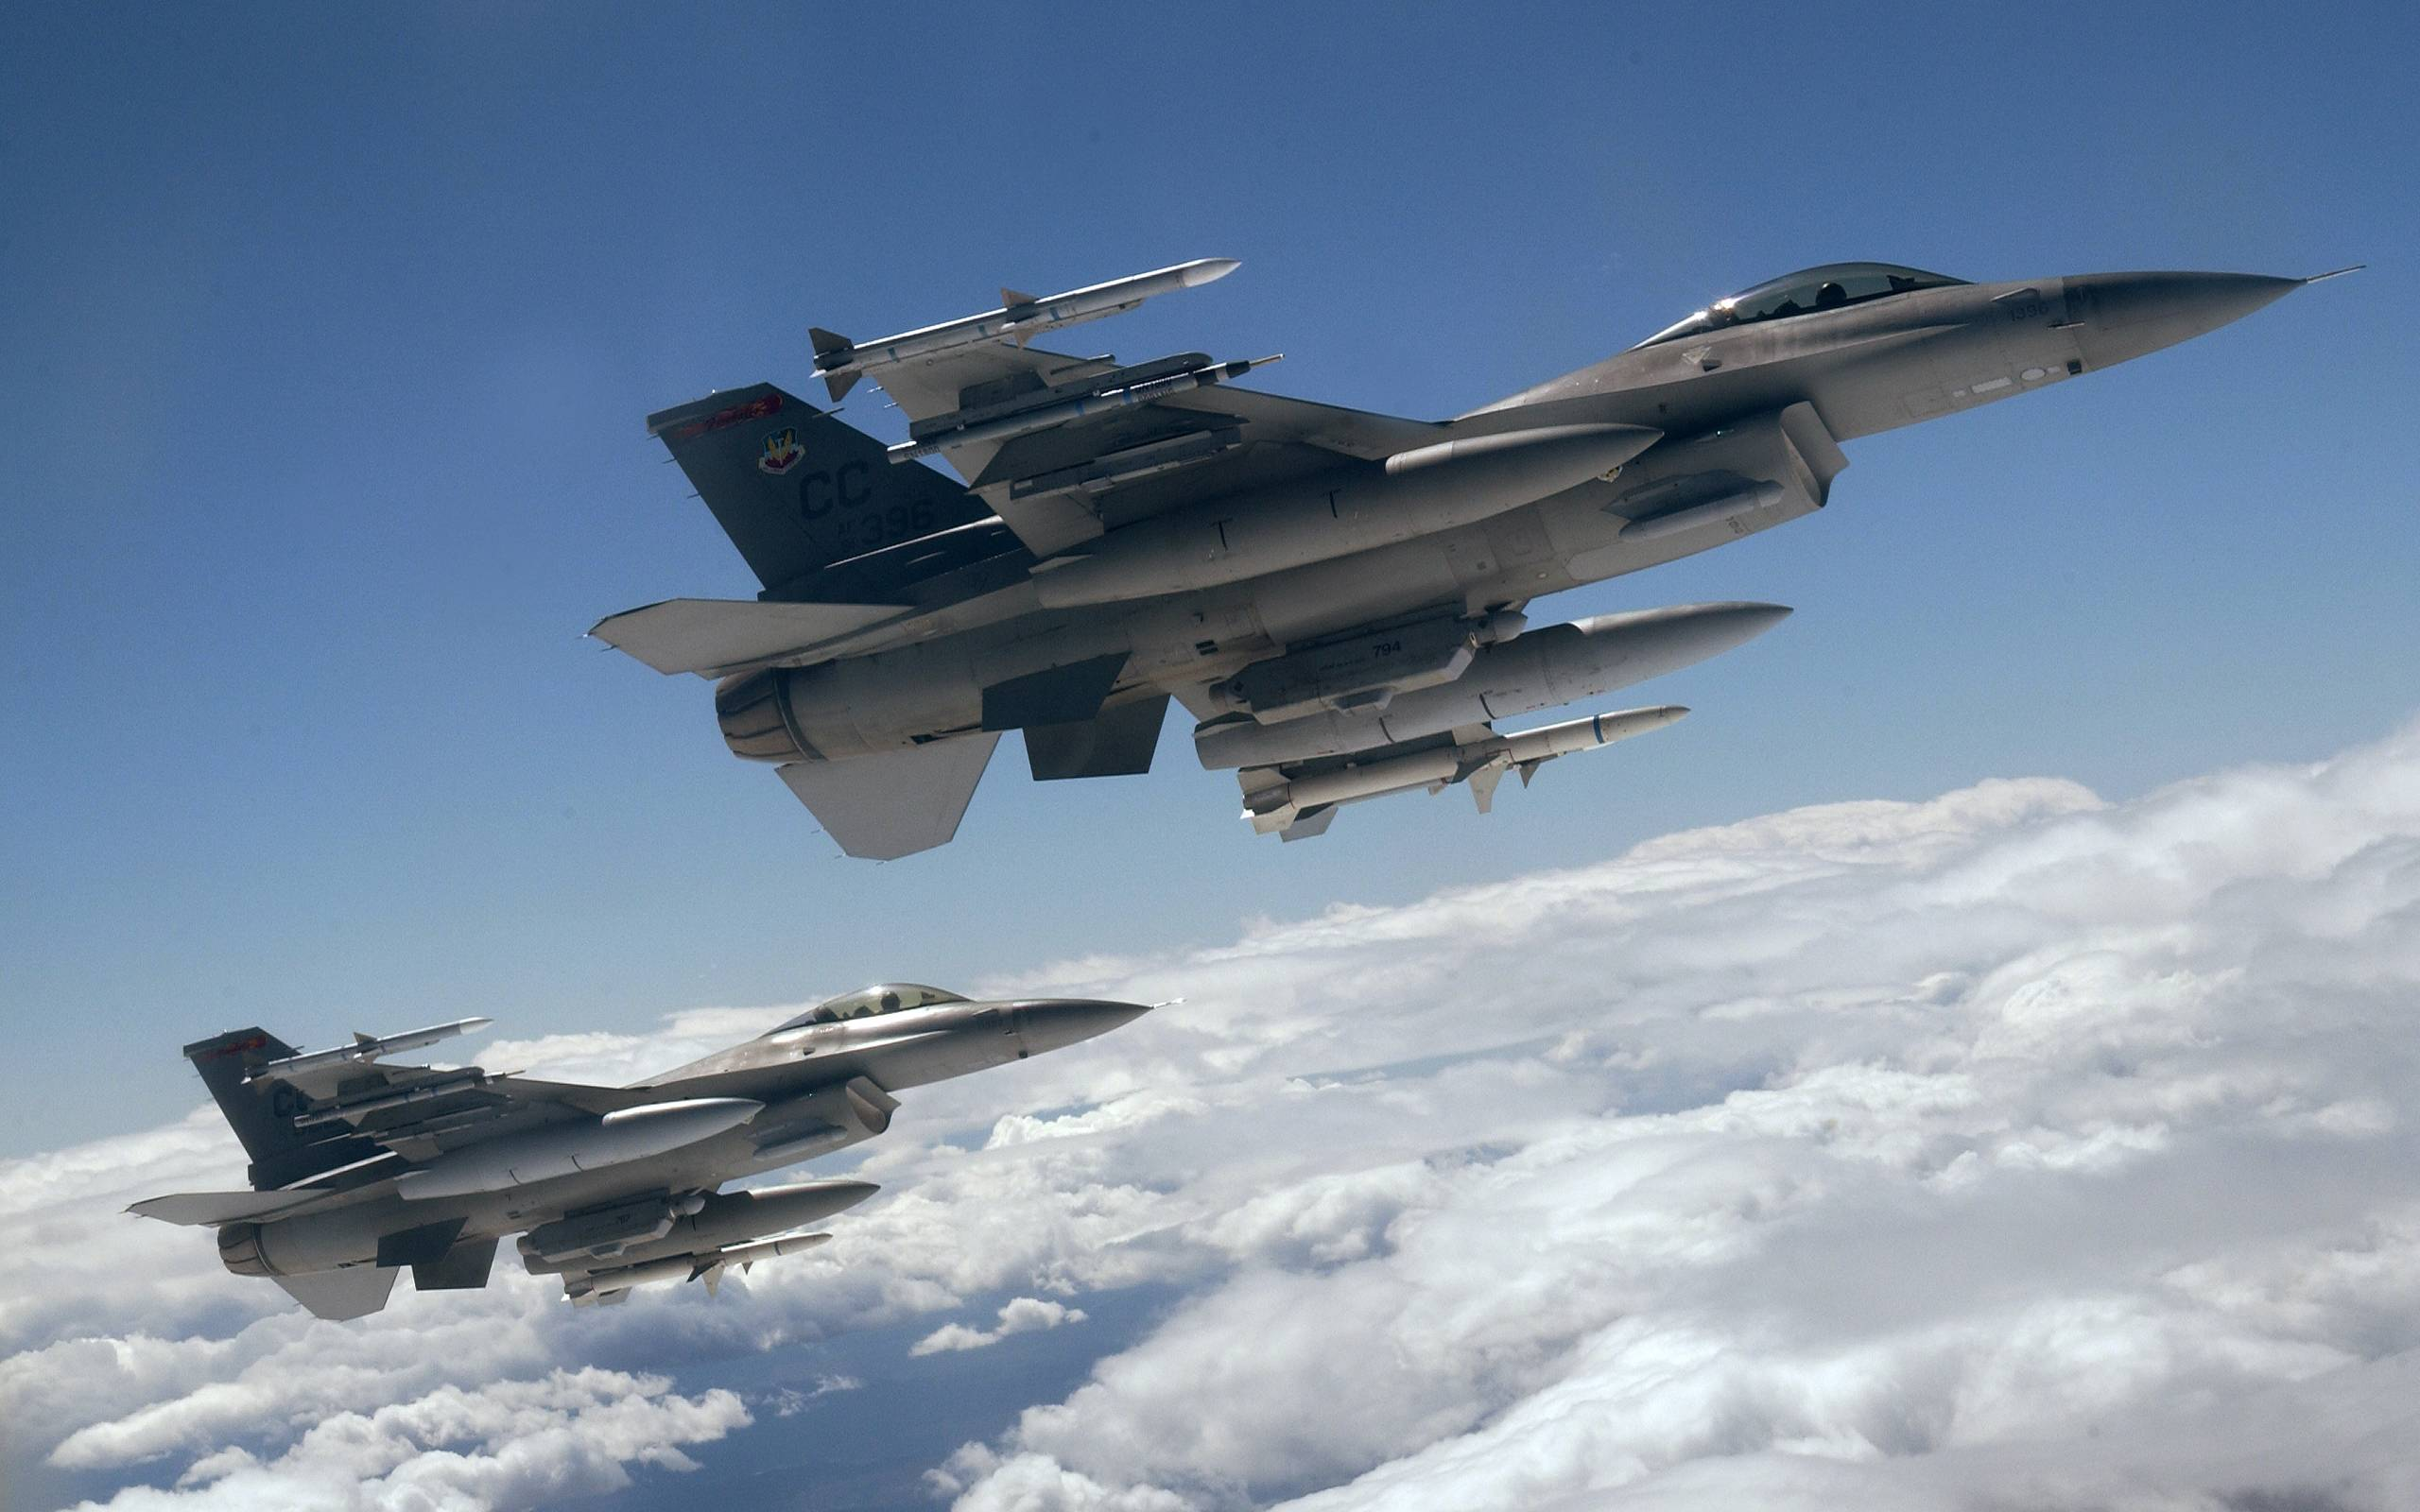 Обои истребители, воздух, ракеты, облака